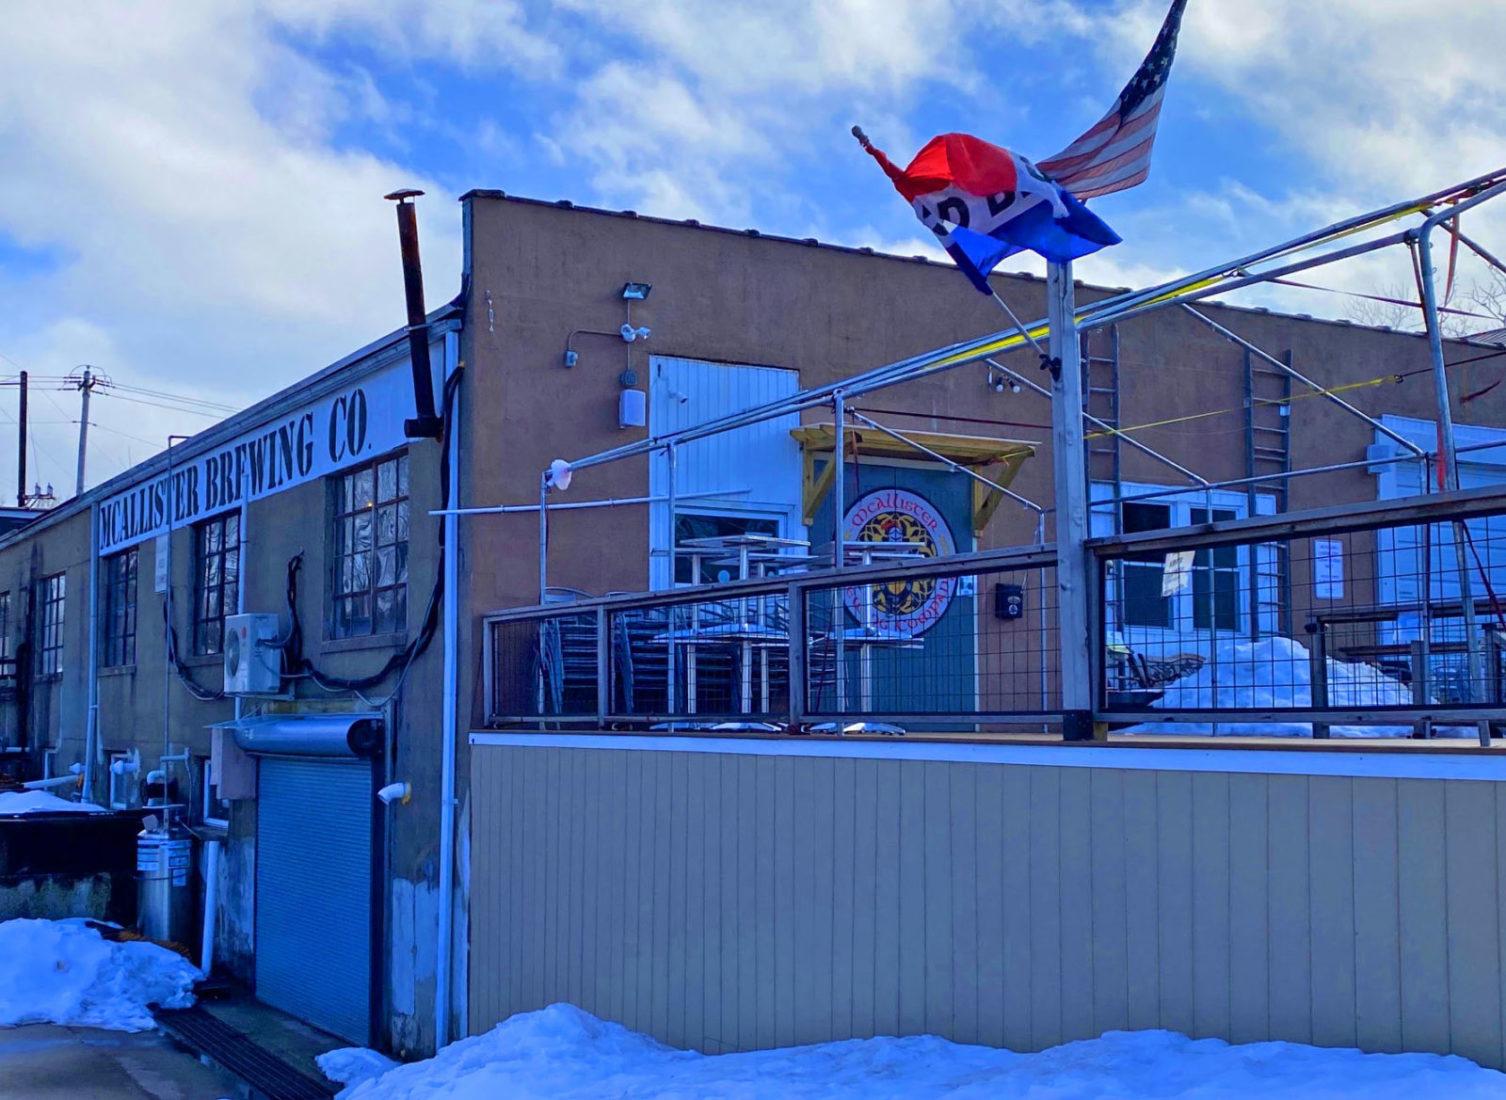 484. McAllister Brewing Co, Landsdale PA, 2021